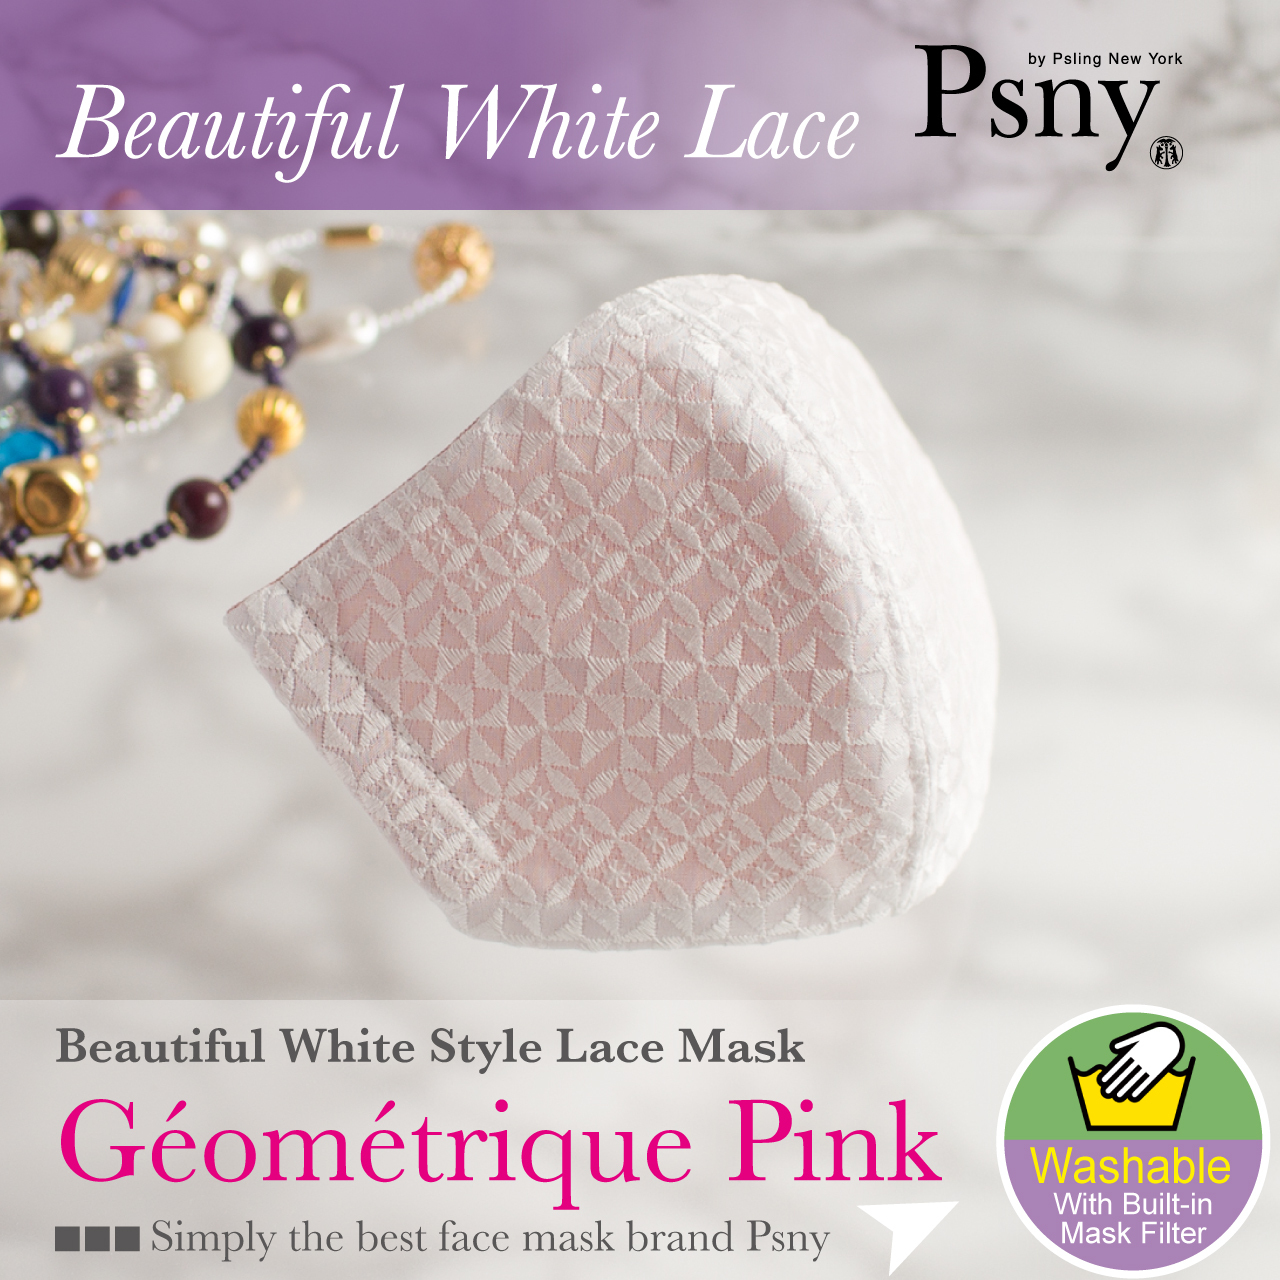 PSNY レース ホワイト・ジオ-ピンク 花粉 不織布フィルター入り 立体 大人用 美しい 高級 マスク 送料無料 LW7p